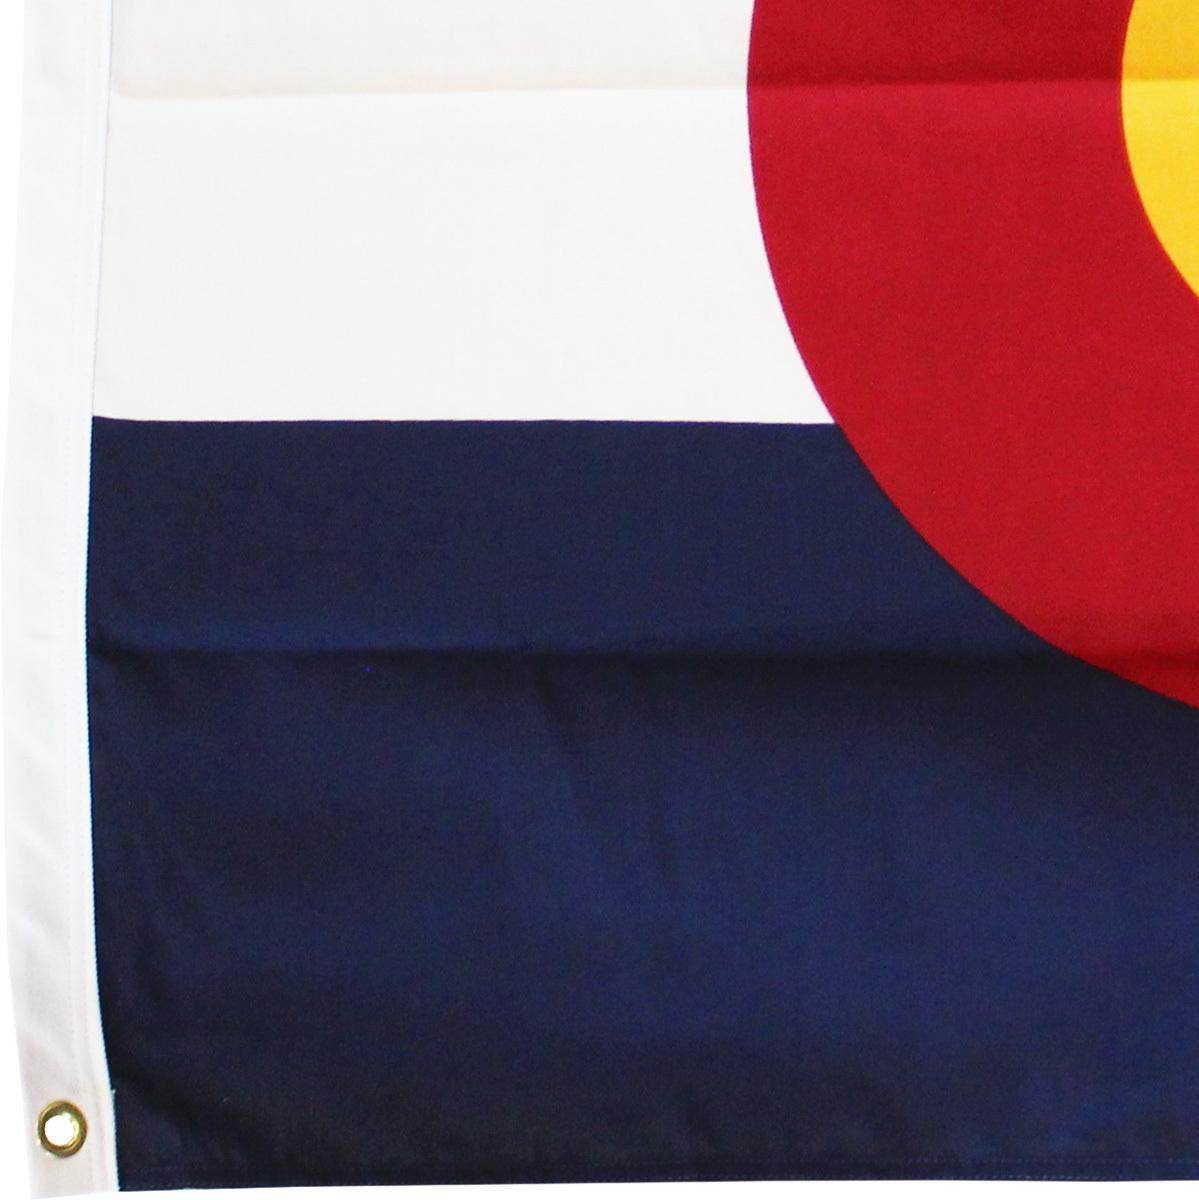 Colorado - 4'X6' Heavy Duty 2-Ply Polyester Flag